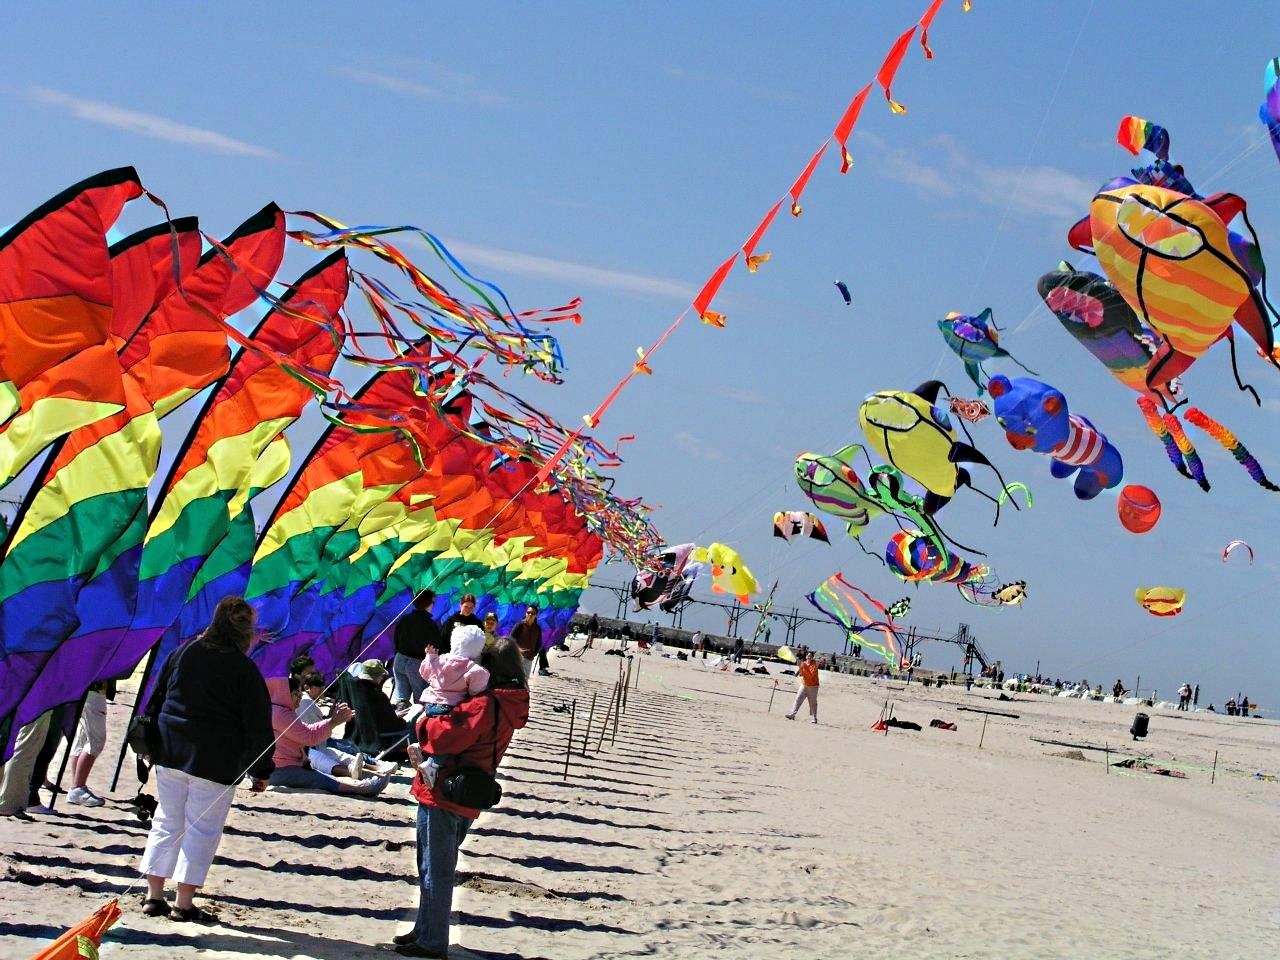 Grand Haven Kite Festival... photo by Thomas Peace 2013